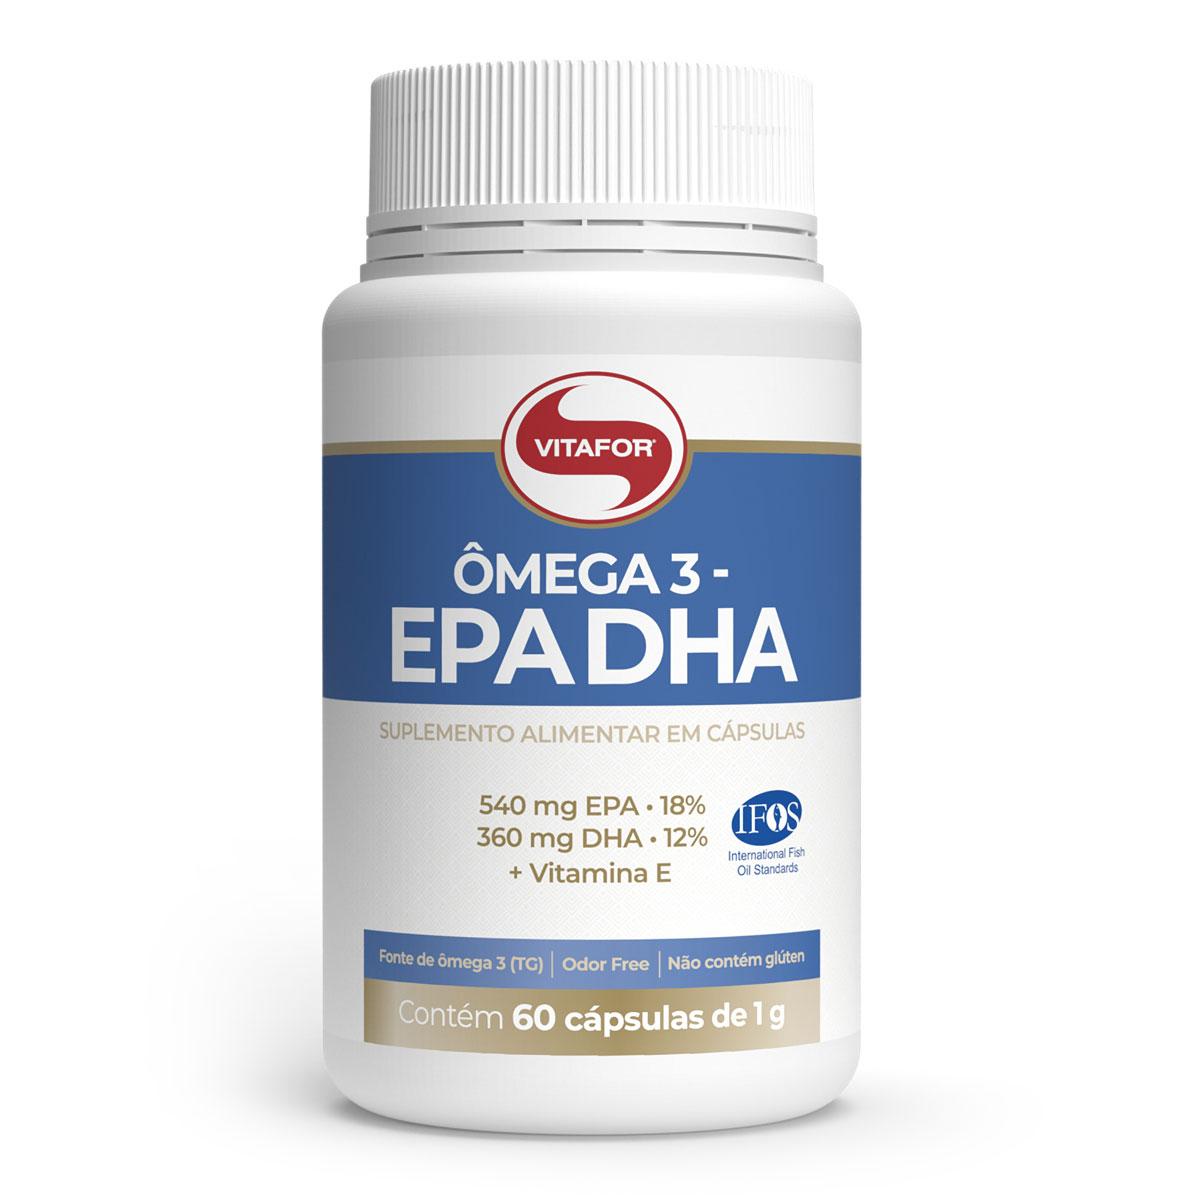 Ômega 3 1000 mg (60 Cápsulas) - Vitafor